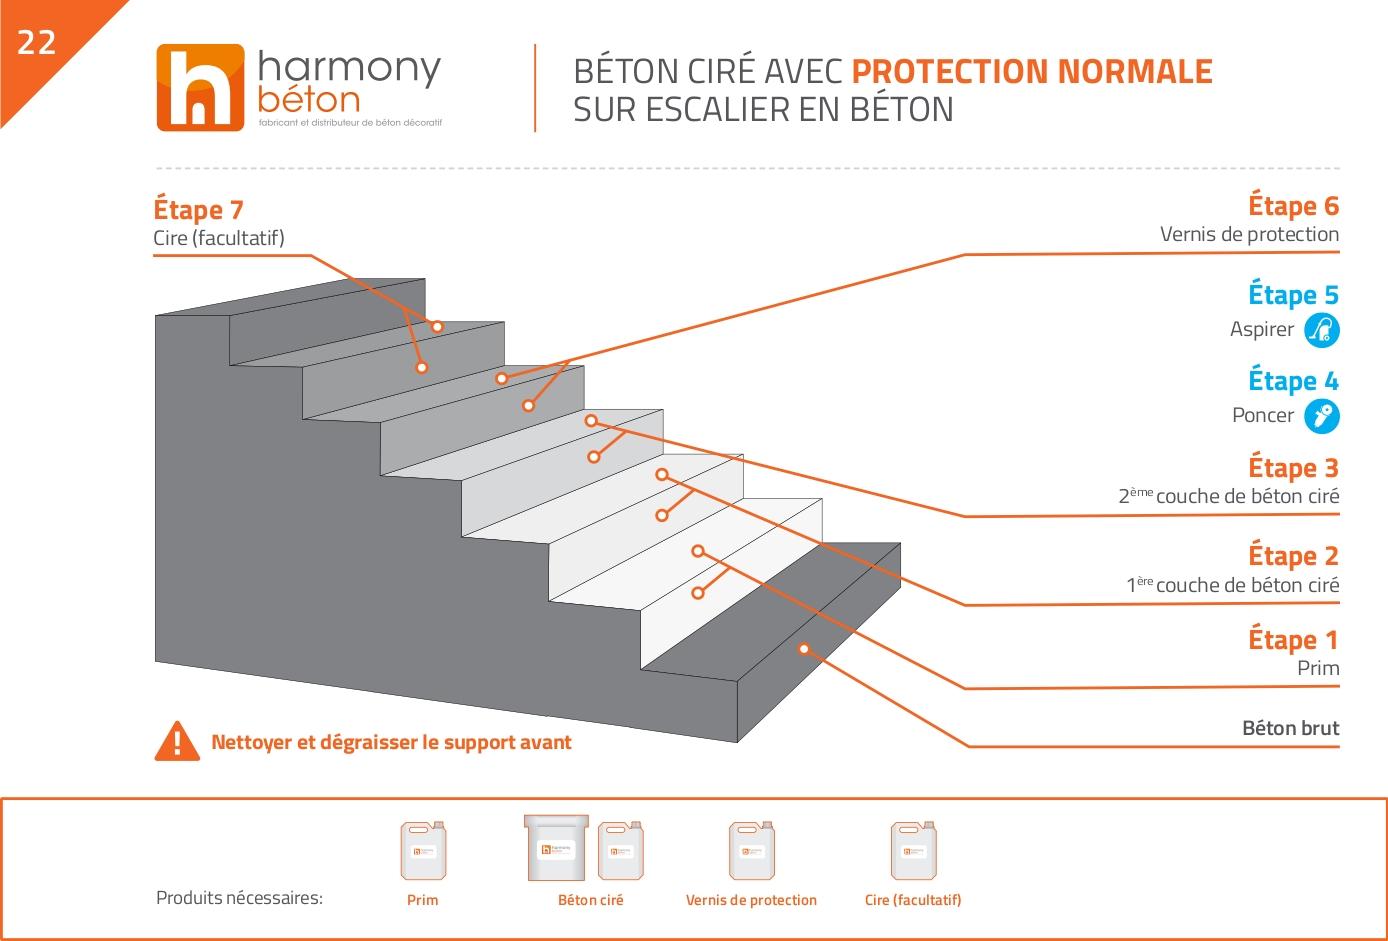 Escalier Beton Ciré Kit Complet Harmony Béton